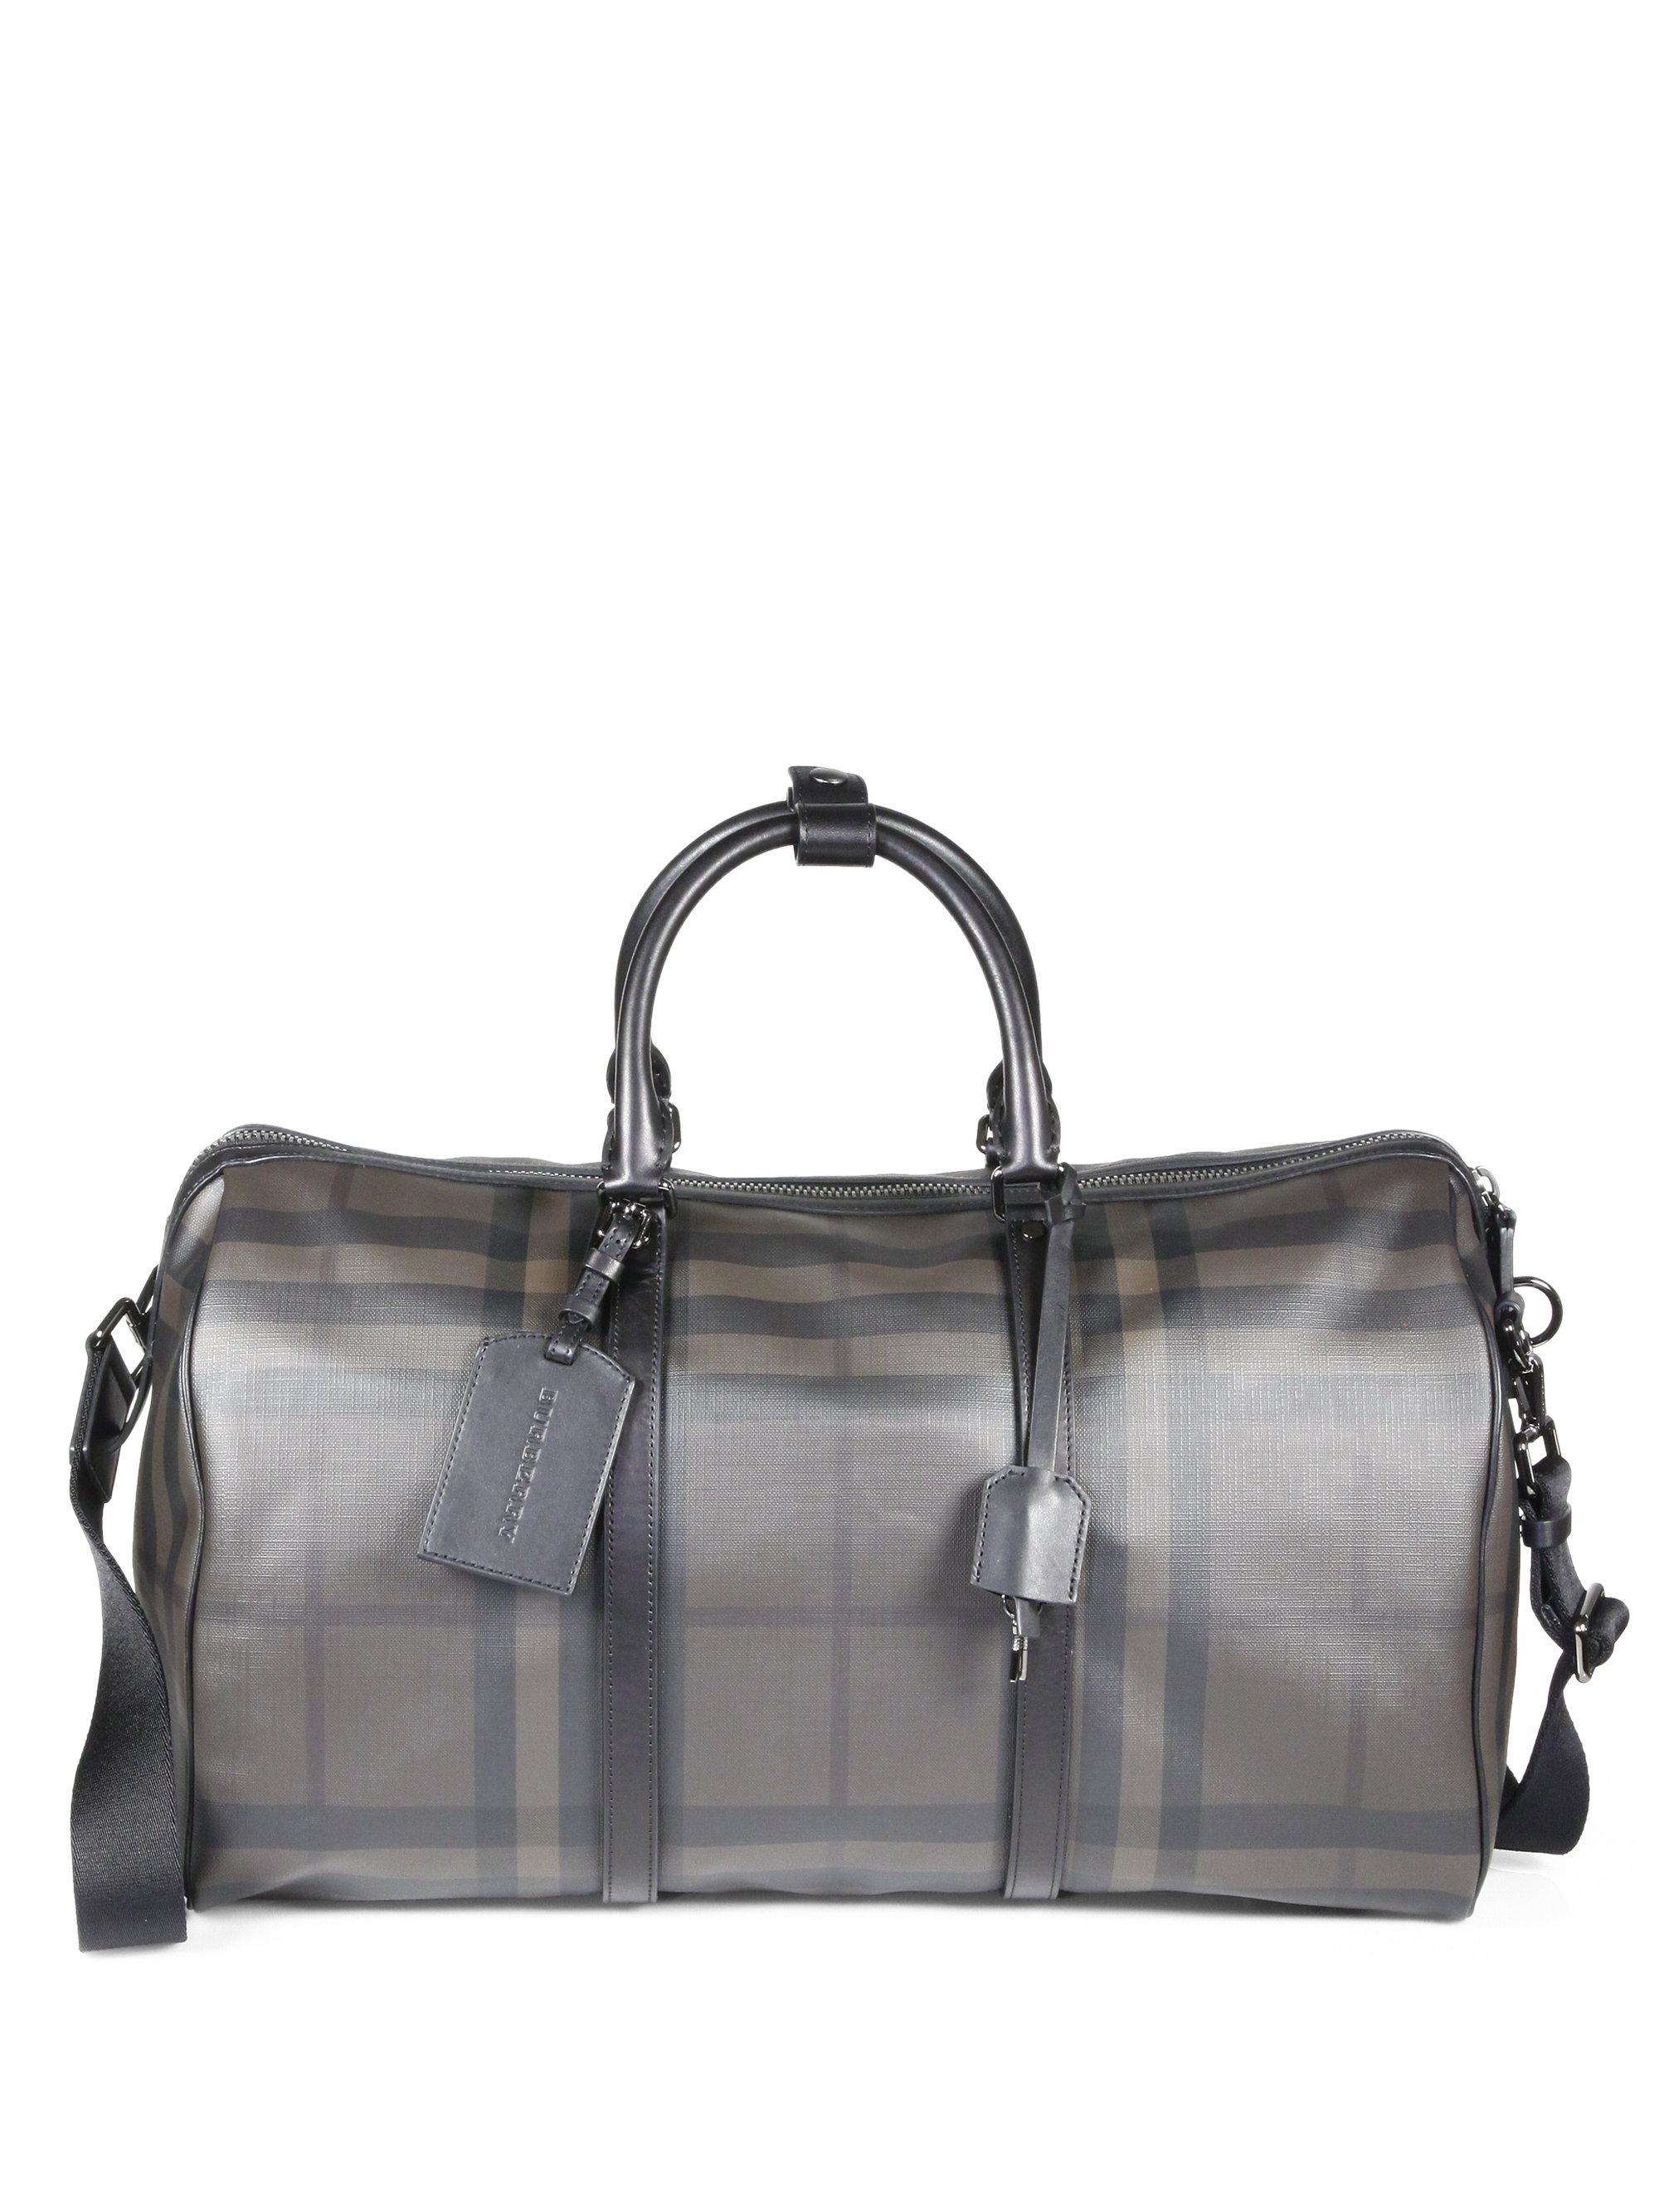 Burberry Black Leather Duffle Bag   ReGreen Springfield 88ba9a78ac